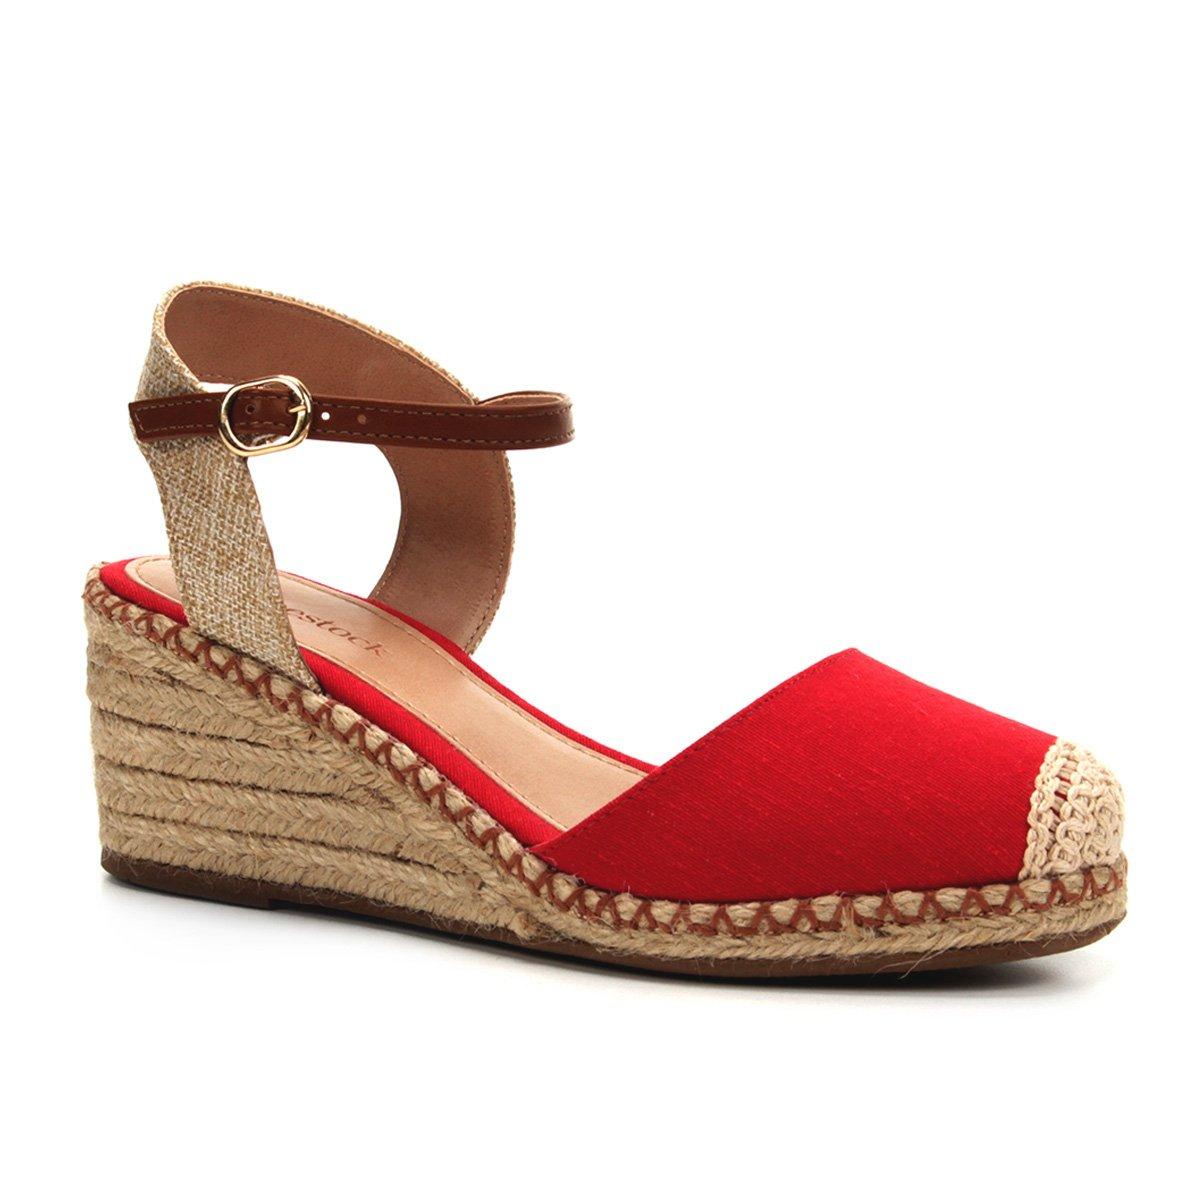 9a04c1dd9 Sandália Anabela Shoestock Corda Lona Feminina